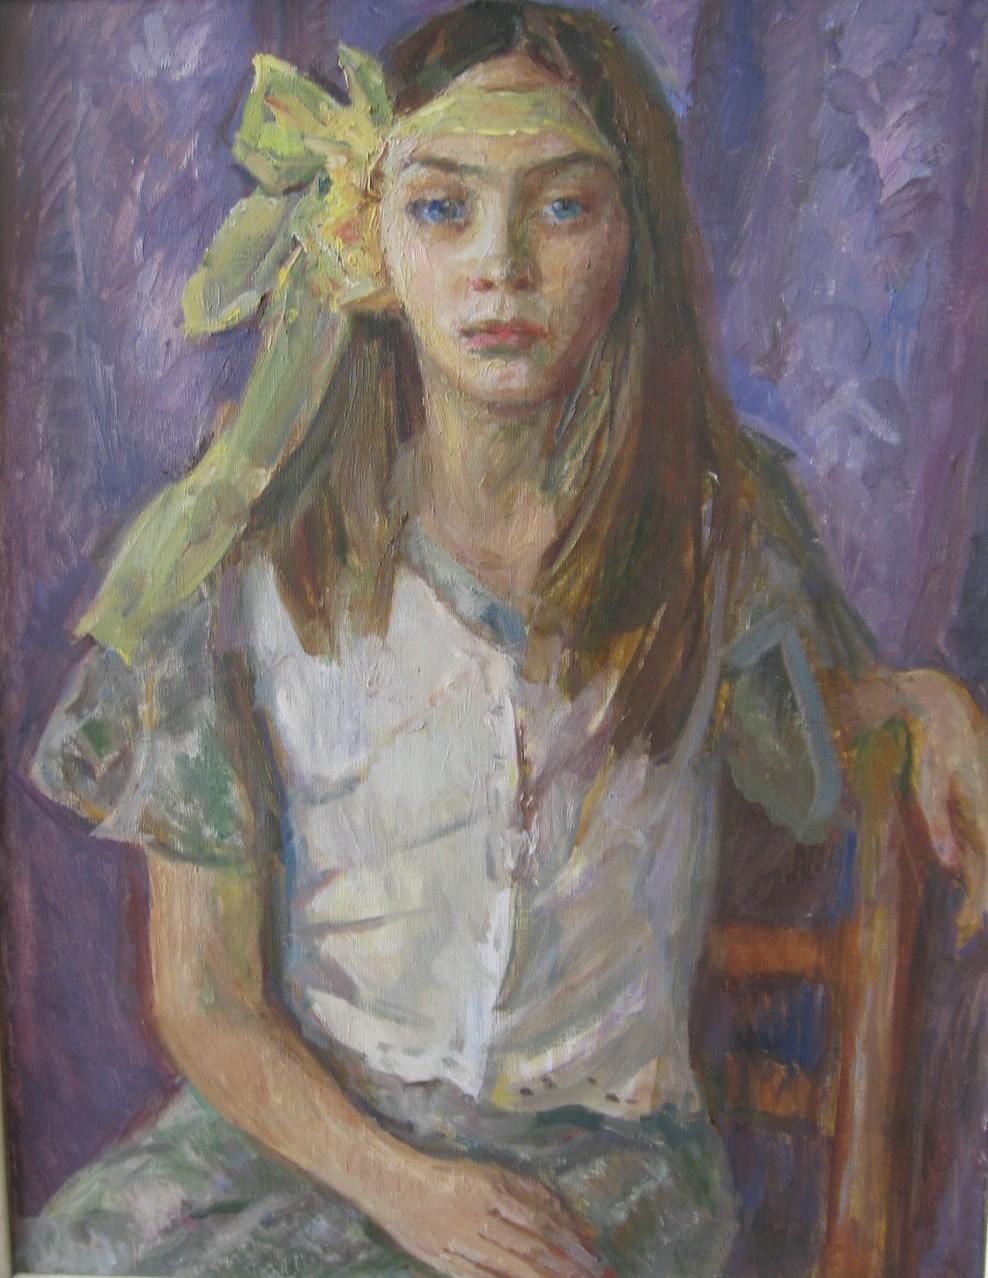 Людмила Сгибнева.     Ксюша.     2003 г.     Холст, масло.     2014 г.    50х60 см.